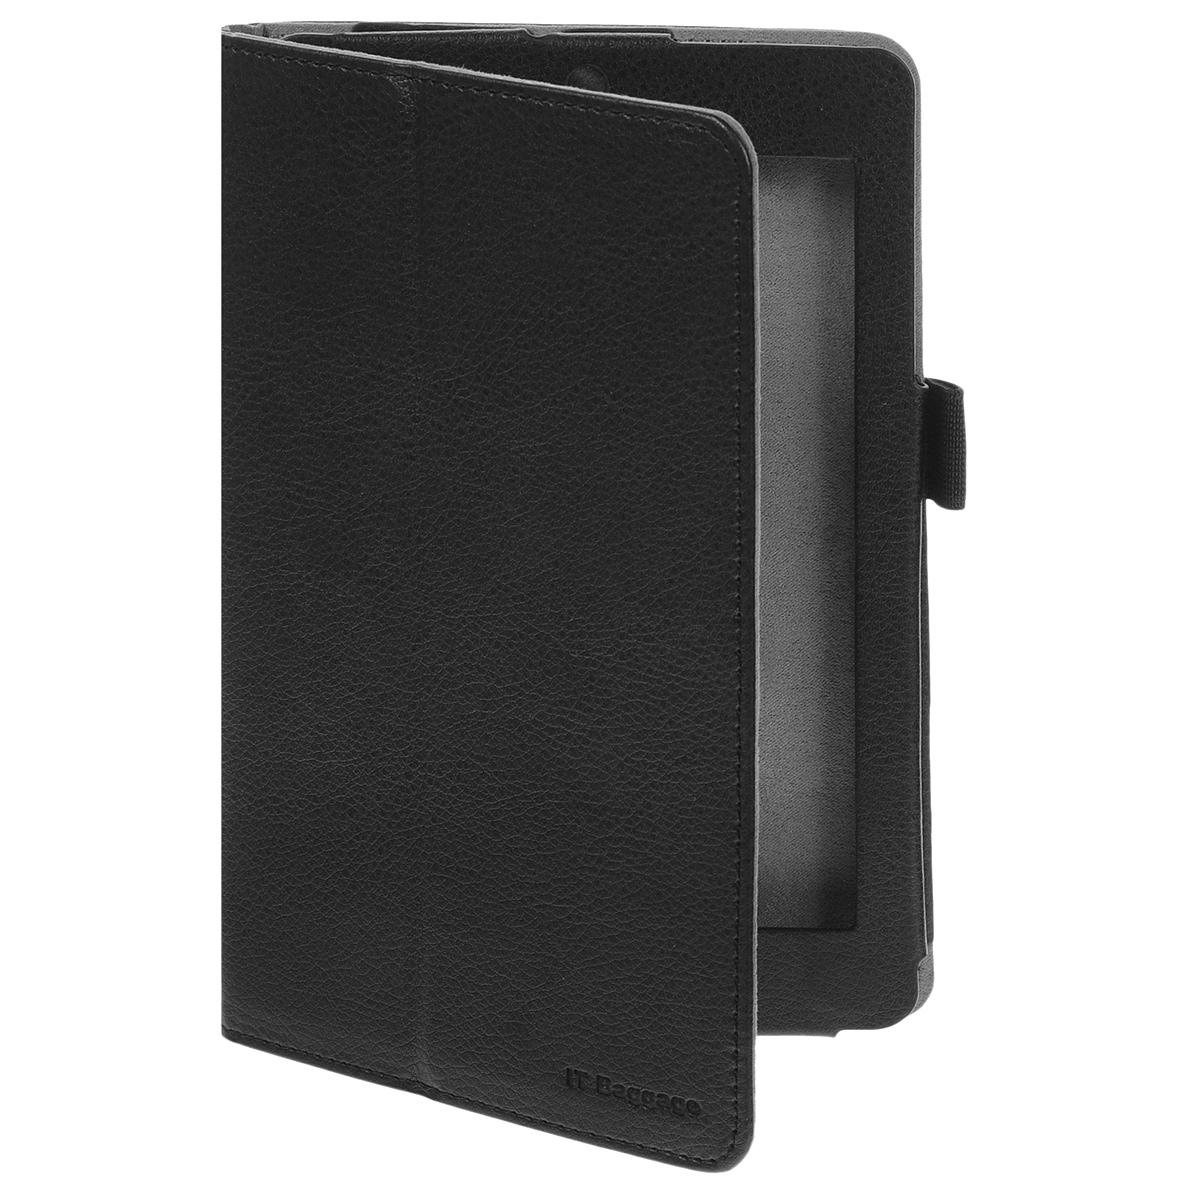 IT Baggage чехол для планшета Acer Iconia Tab B1-730/731, Black планшетный компьютер acer iconia tab a100 в нижнем новгороде